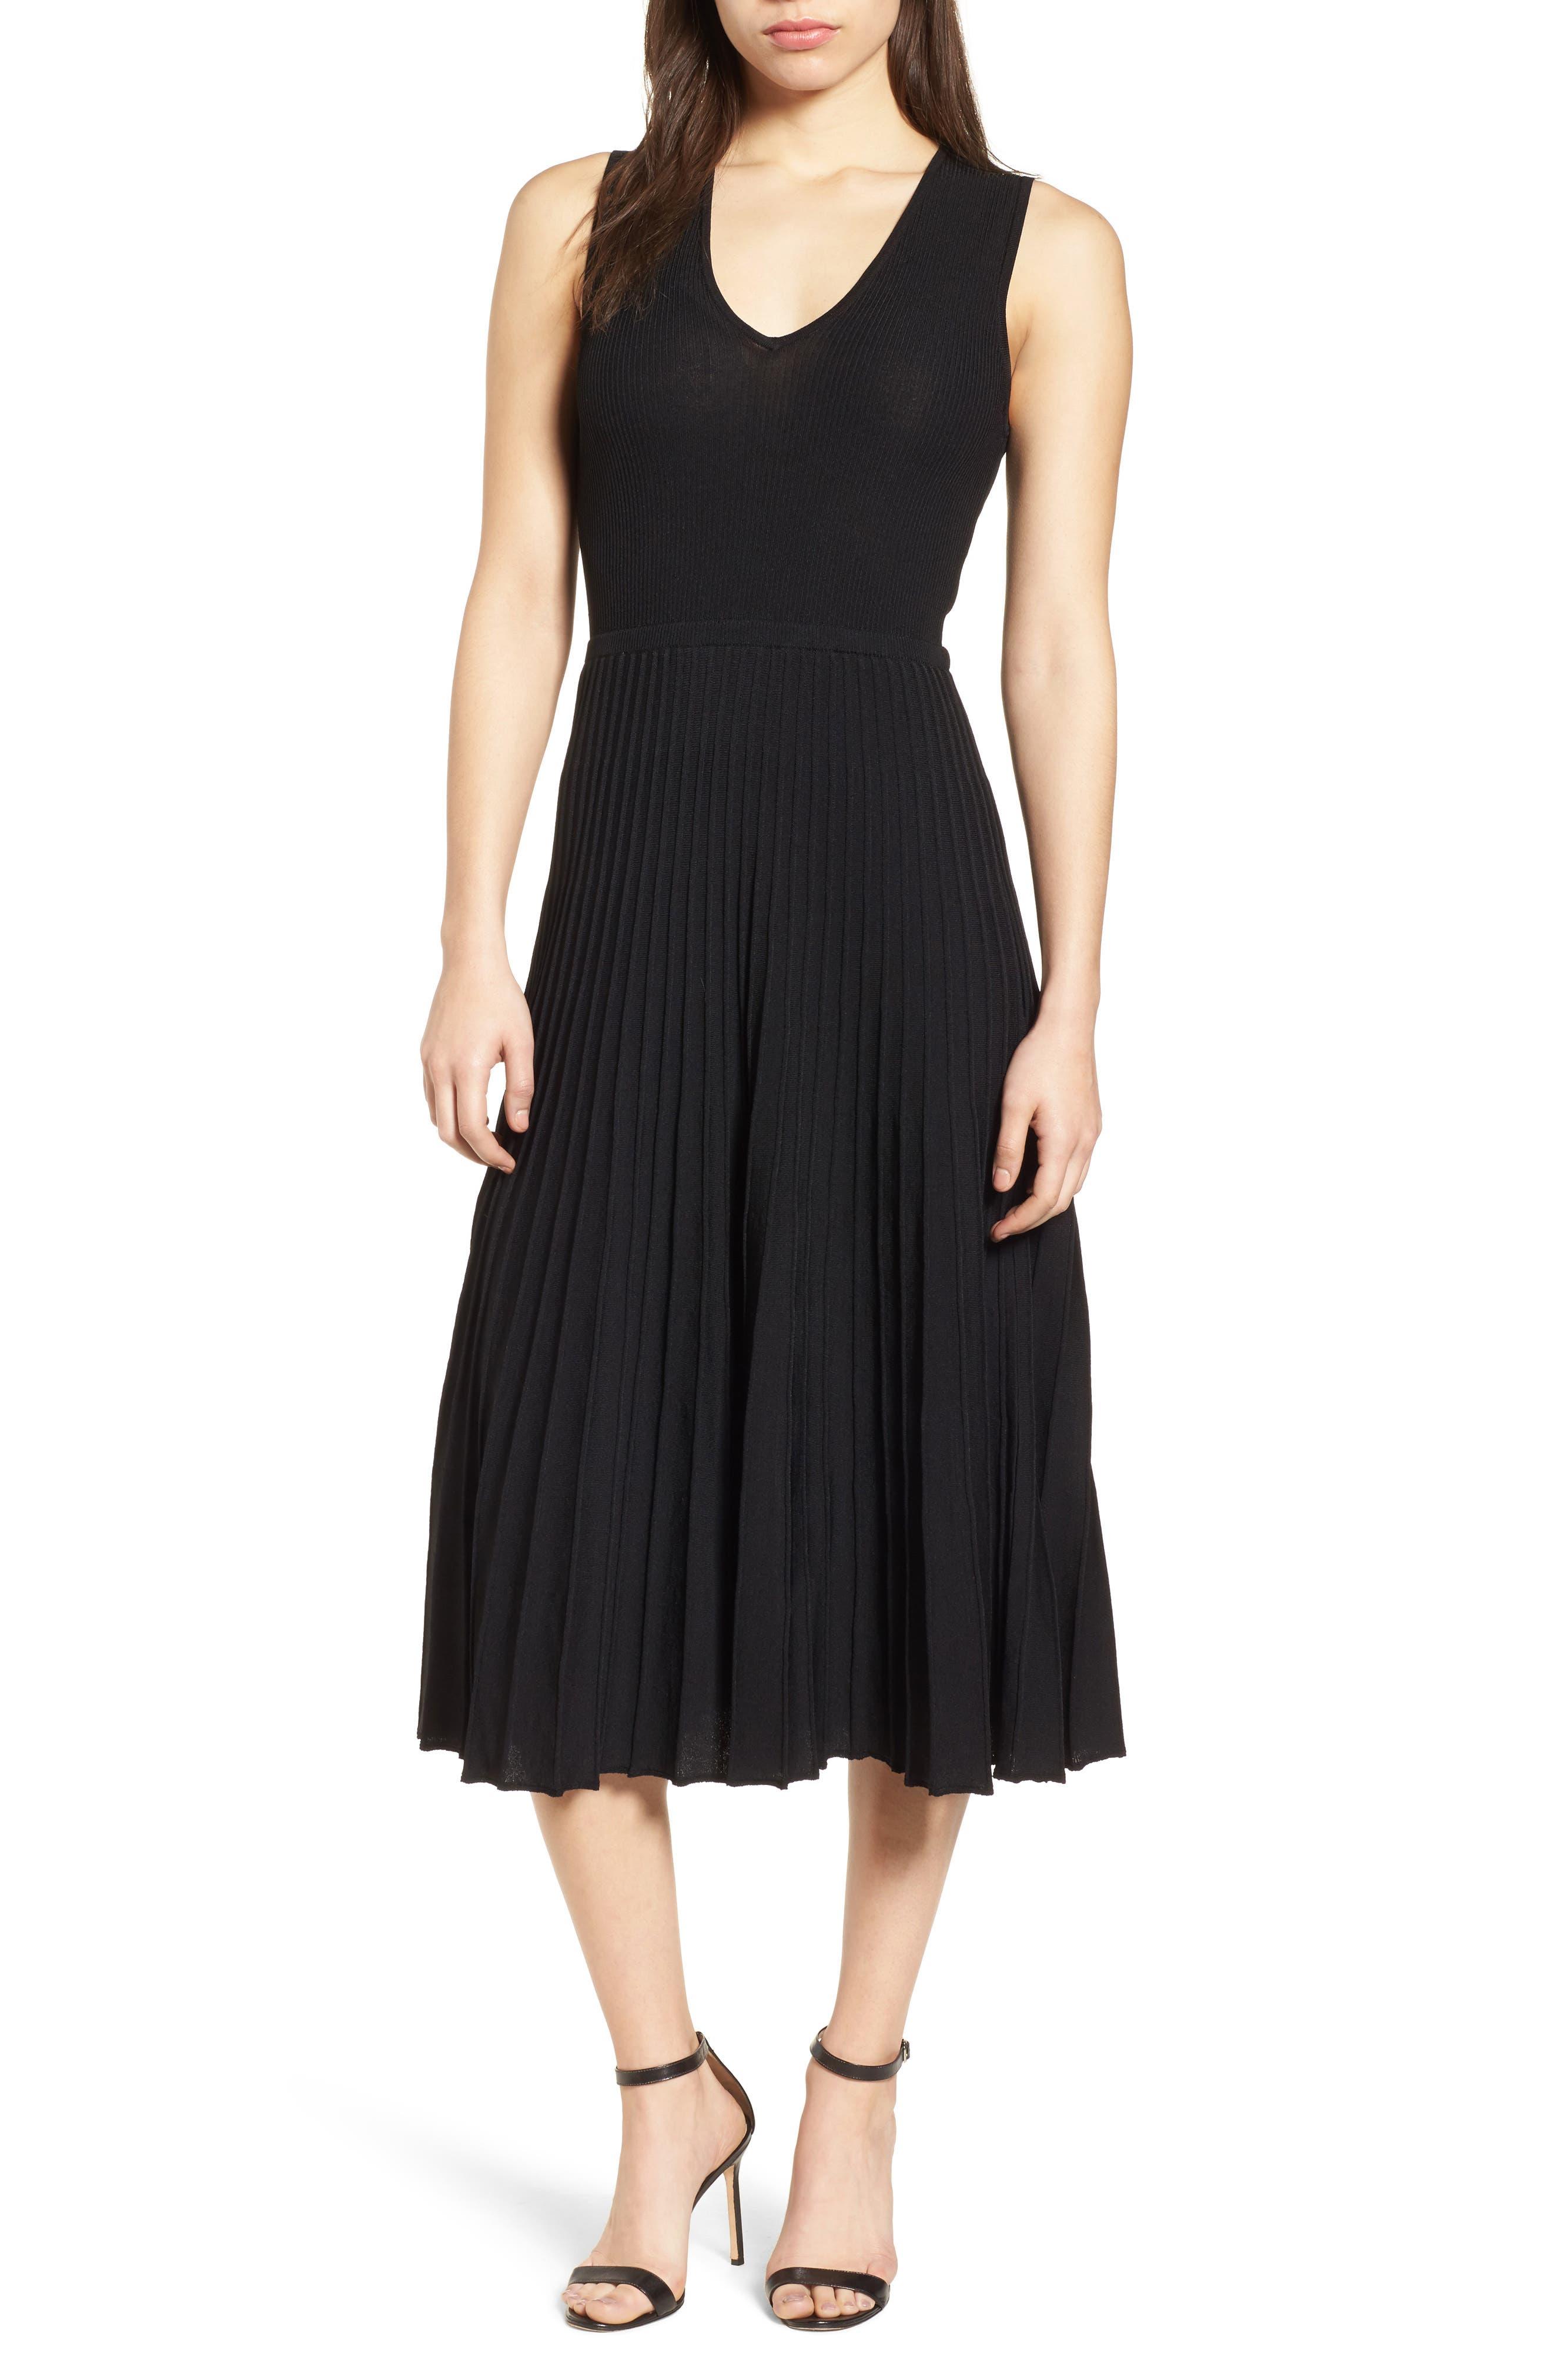 New York Pleated Sweater Midi Dress,                             Main thumbnail 1, color,                             Black